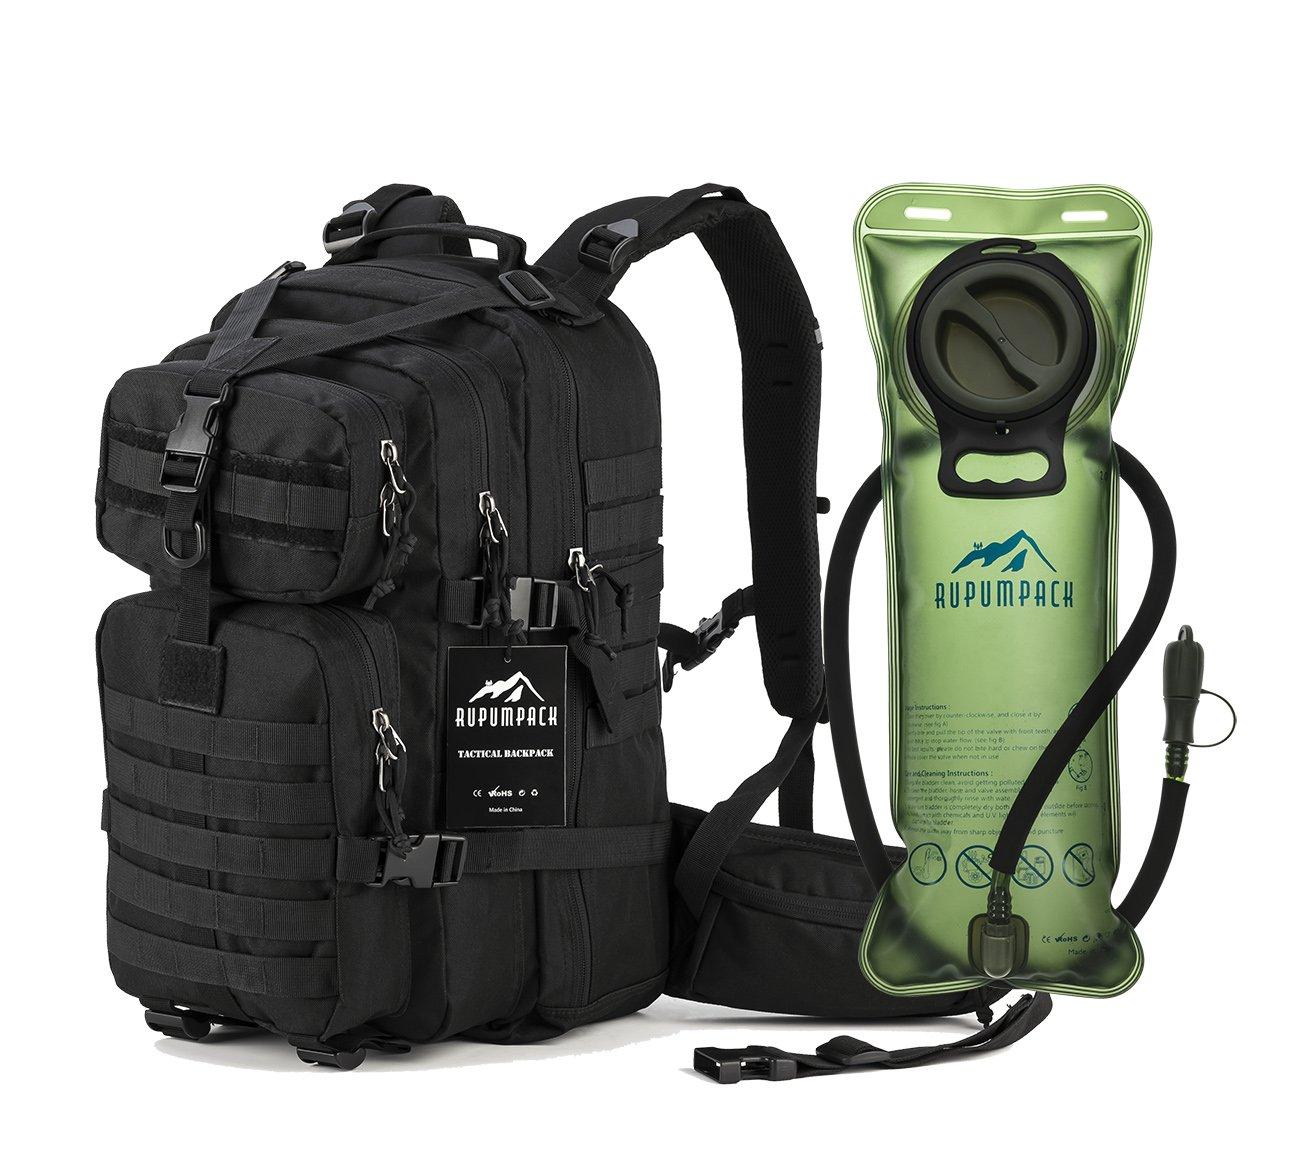 RUPUMPACK Military Tactical Backpack Hydration